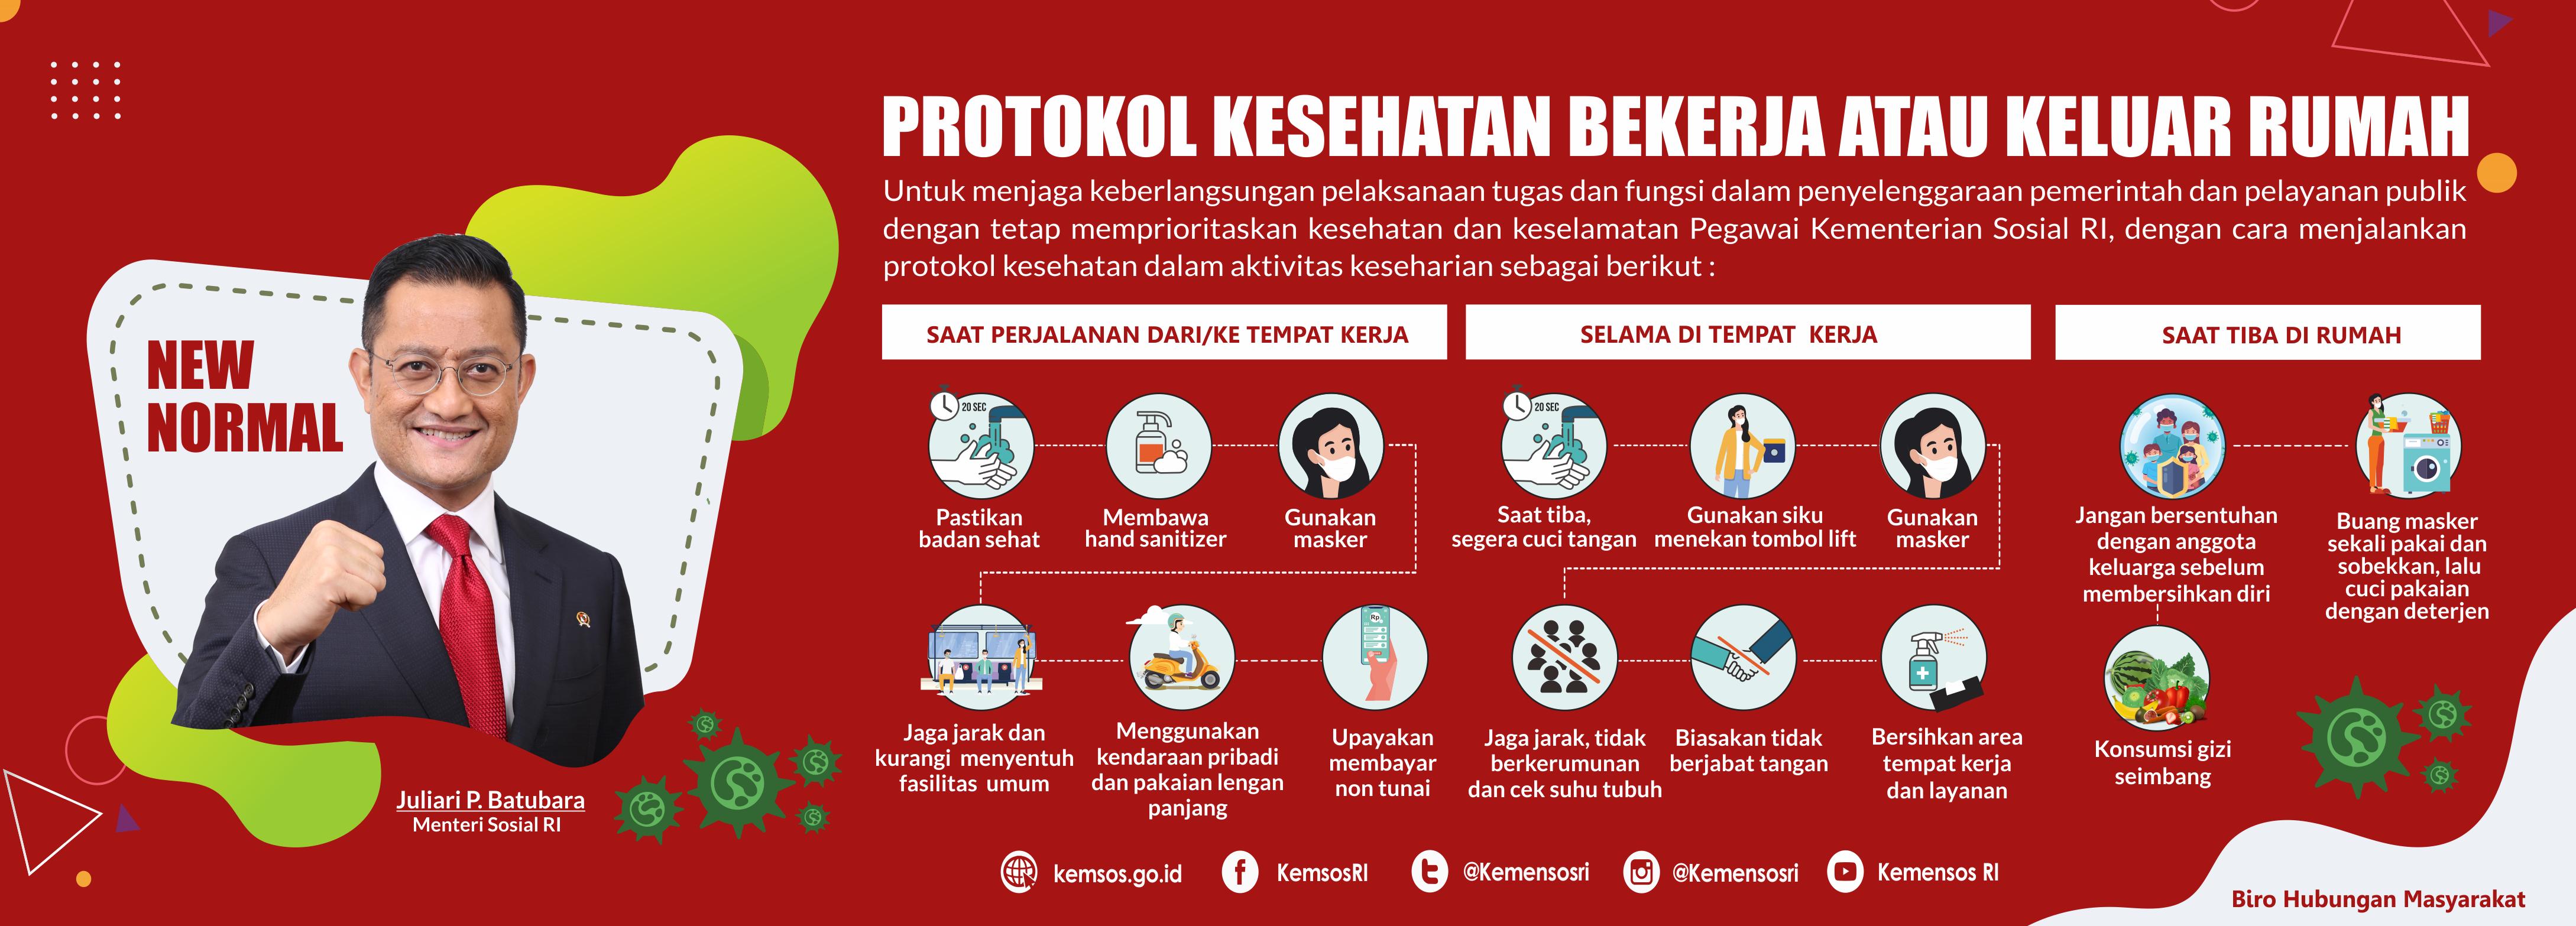 Protokol Kesehatan New Normal